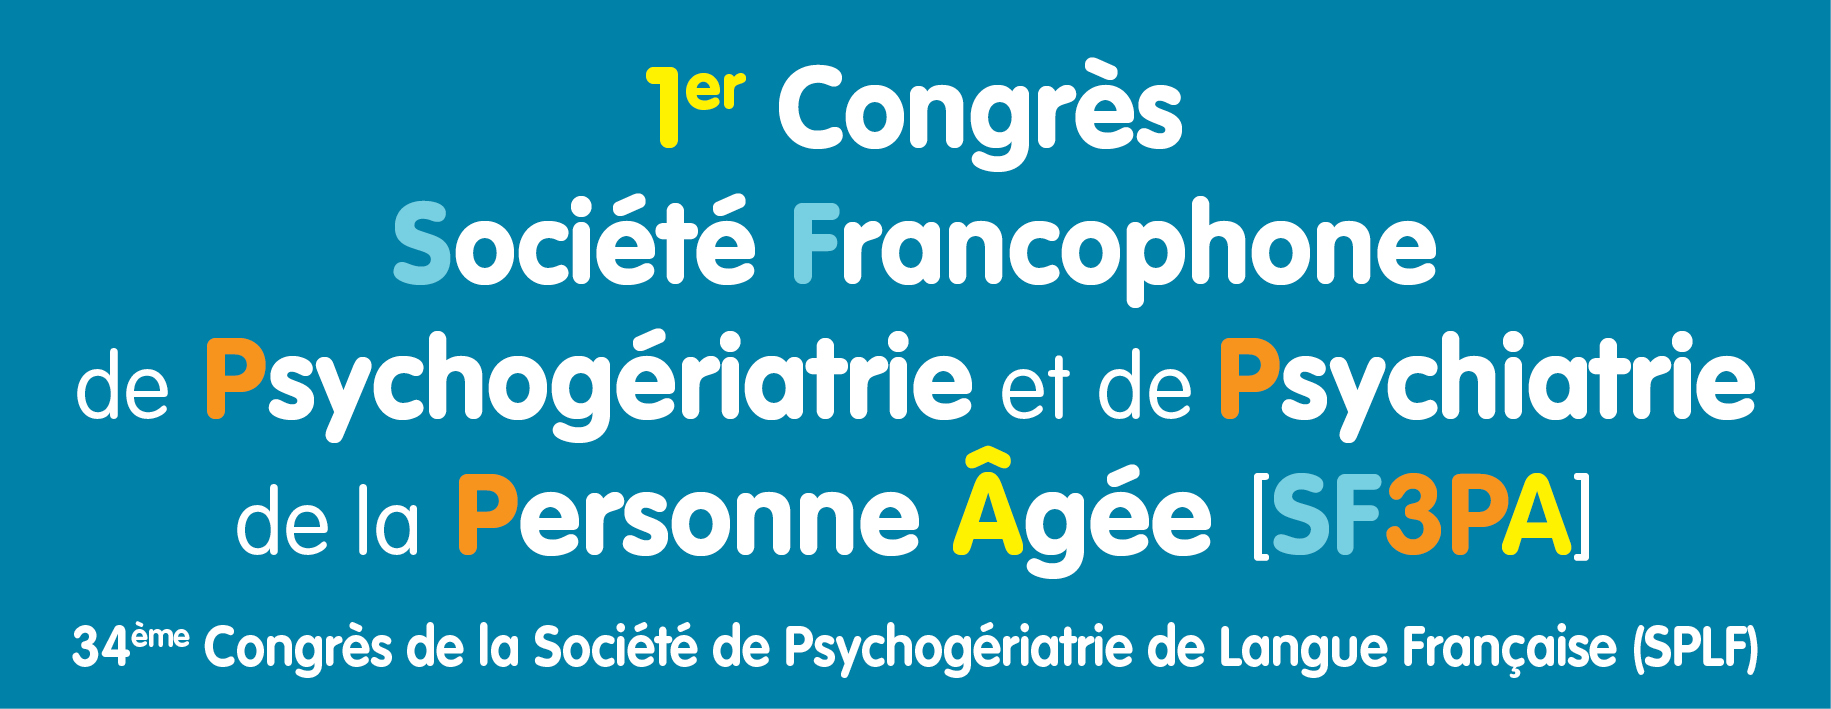 Marseille – Jeudi 20 et vendredi 21 septembre 2018